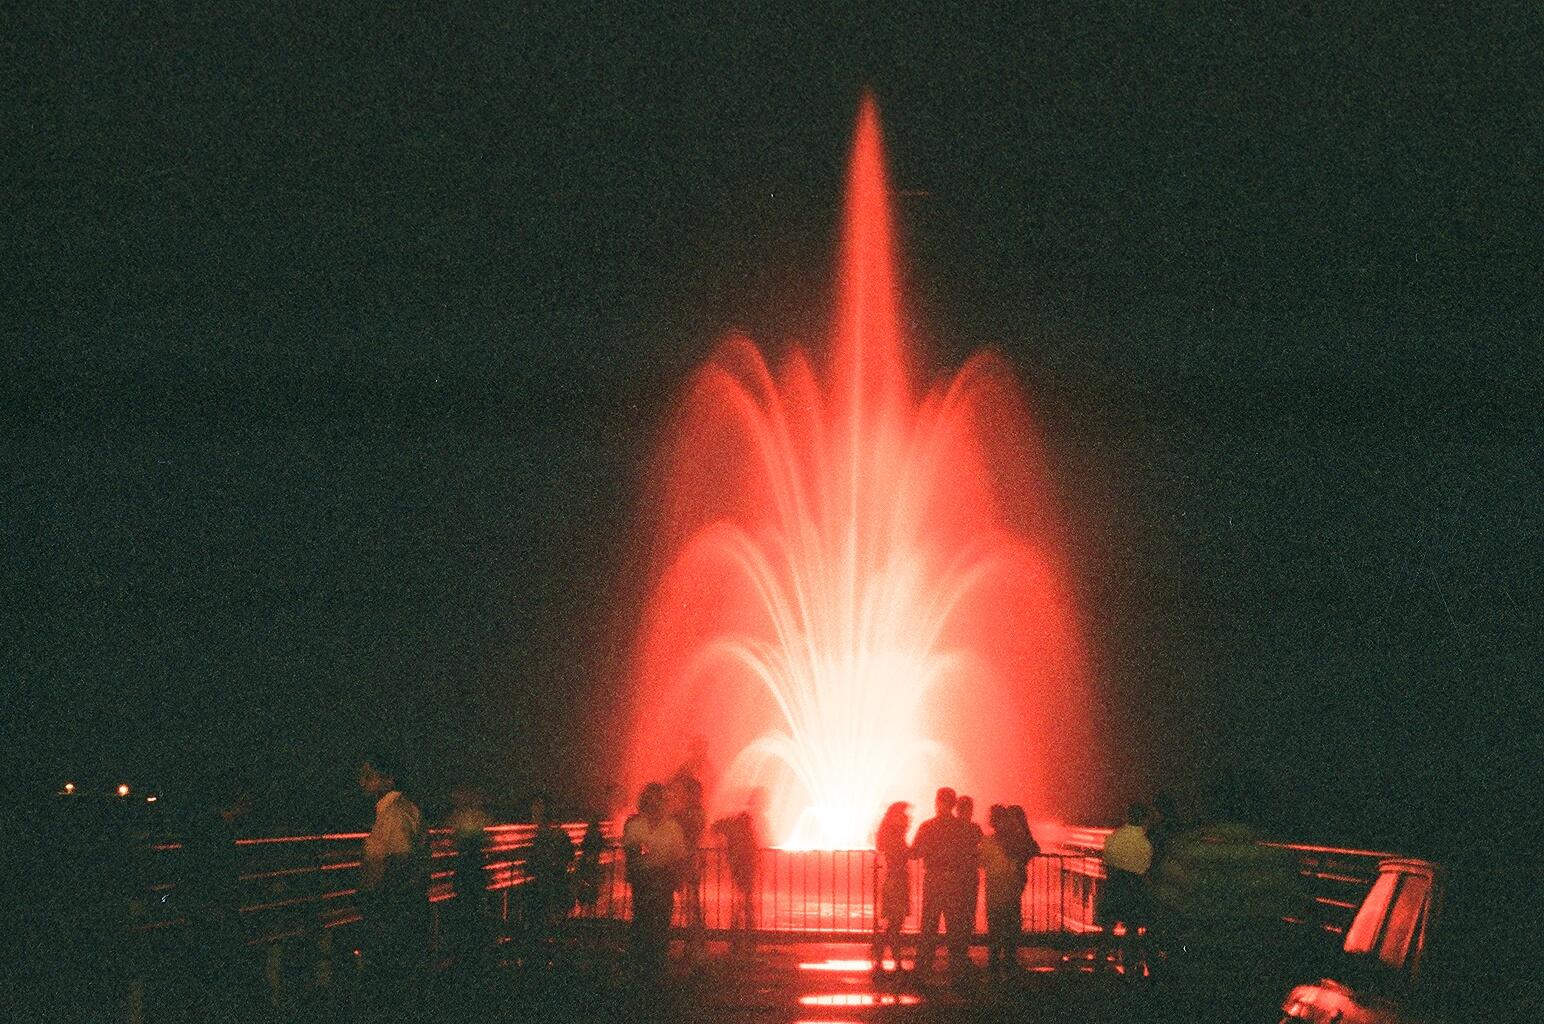 Vulcani D'acqua